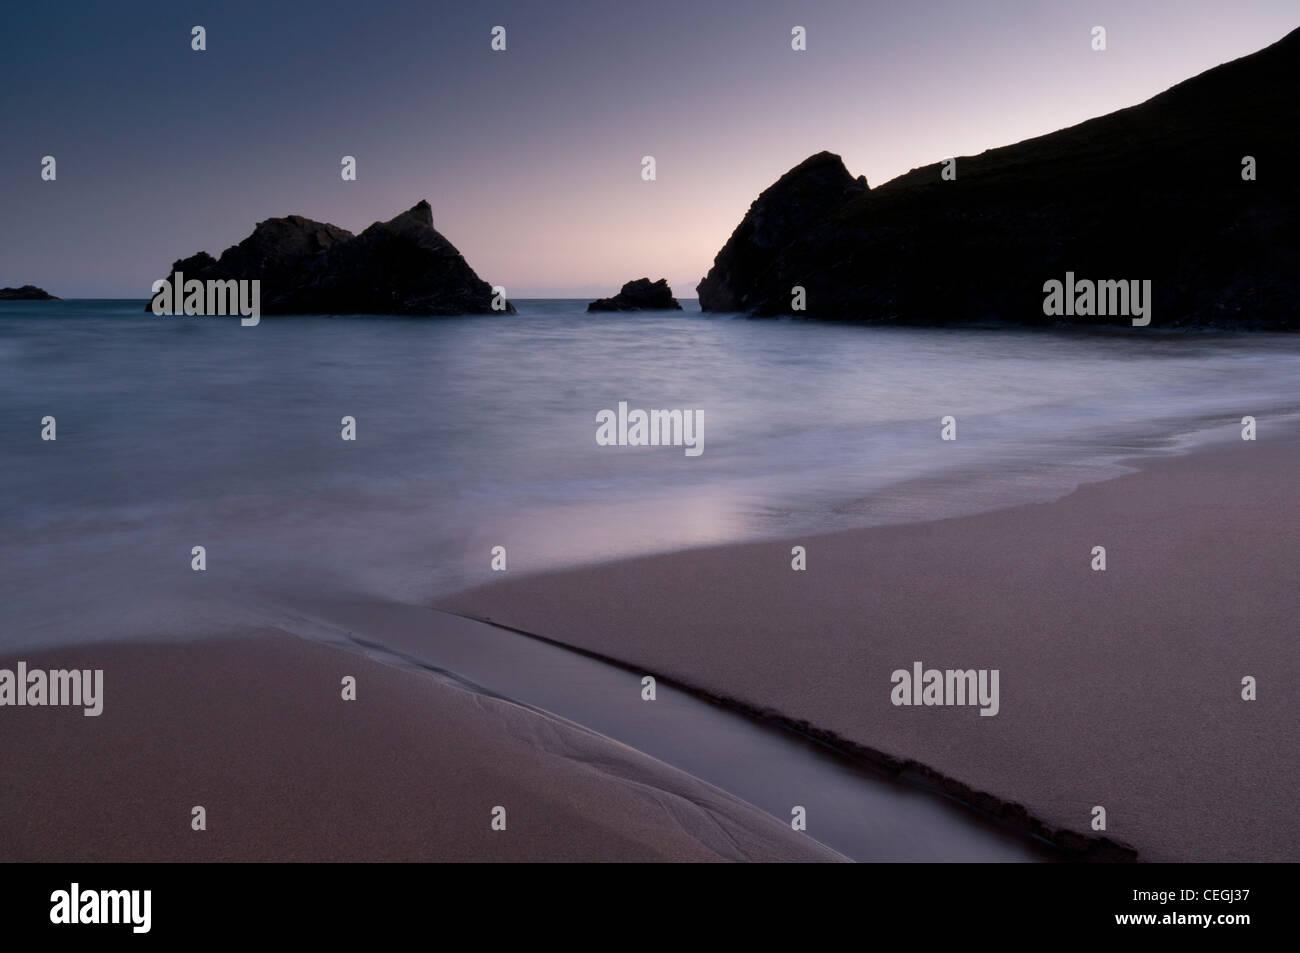 Twilight at Soar Mill Cove, South Devon. - Stock Image